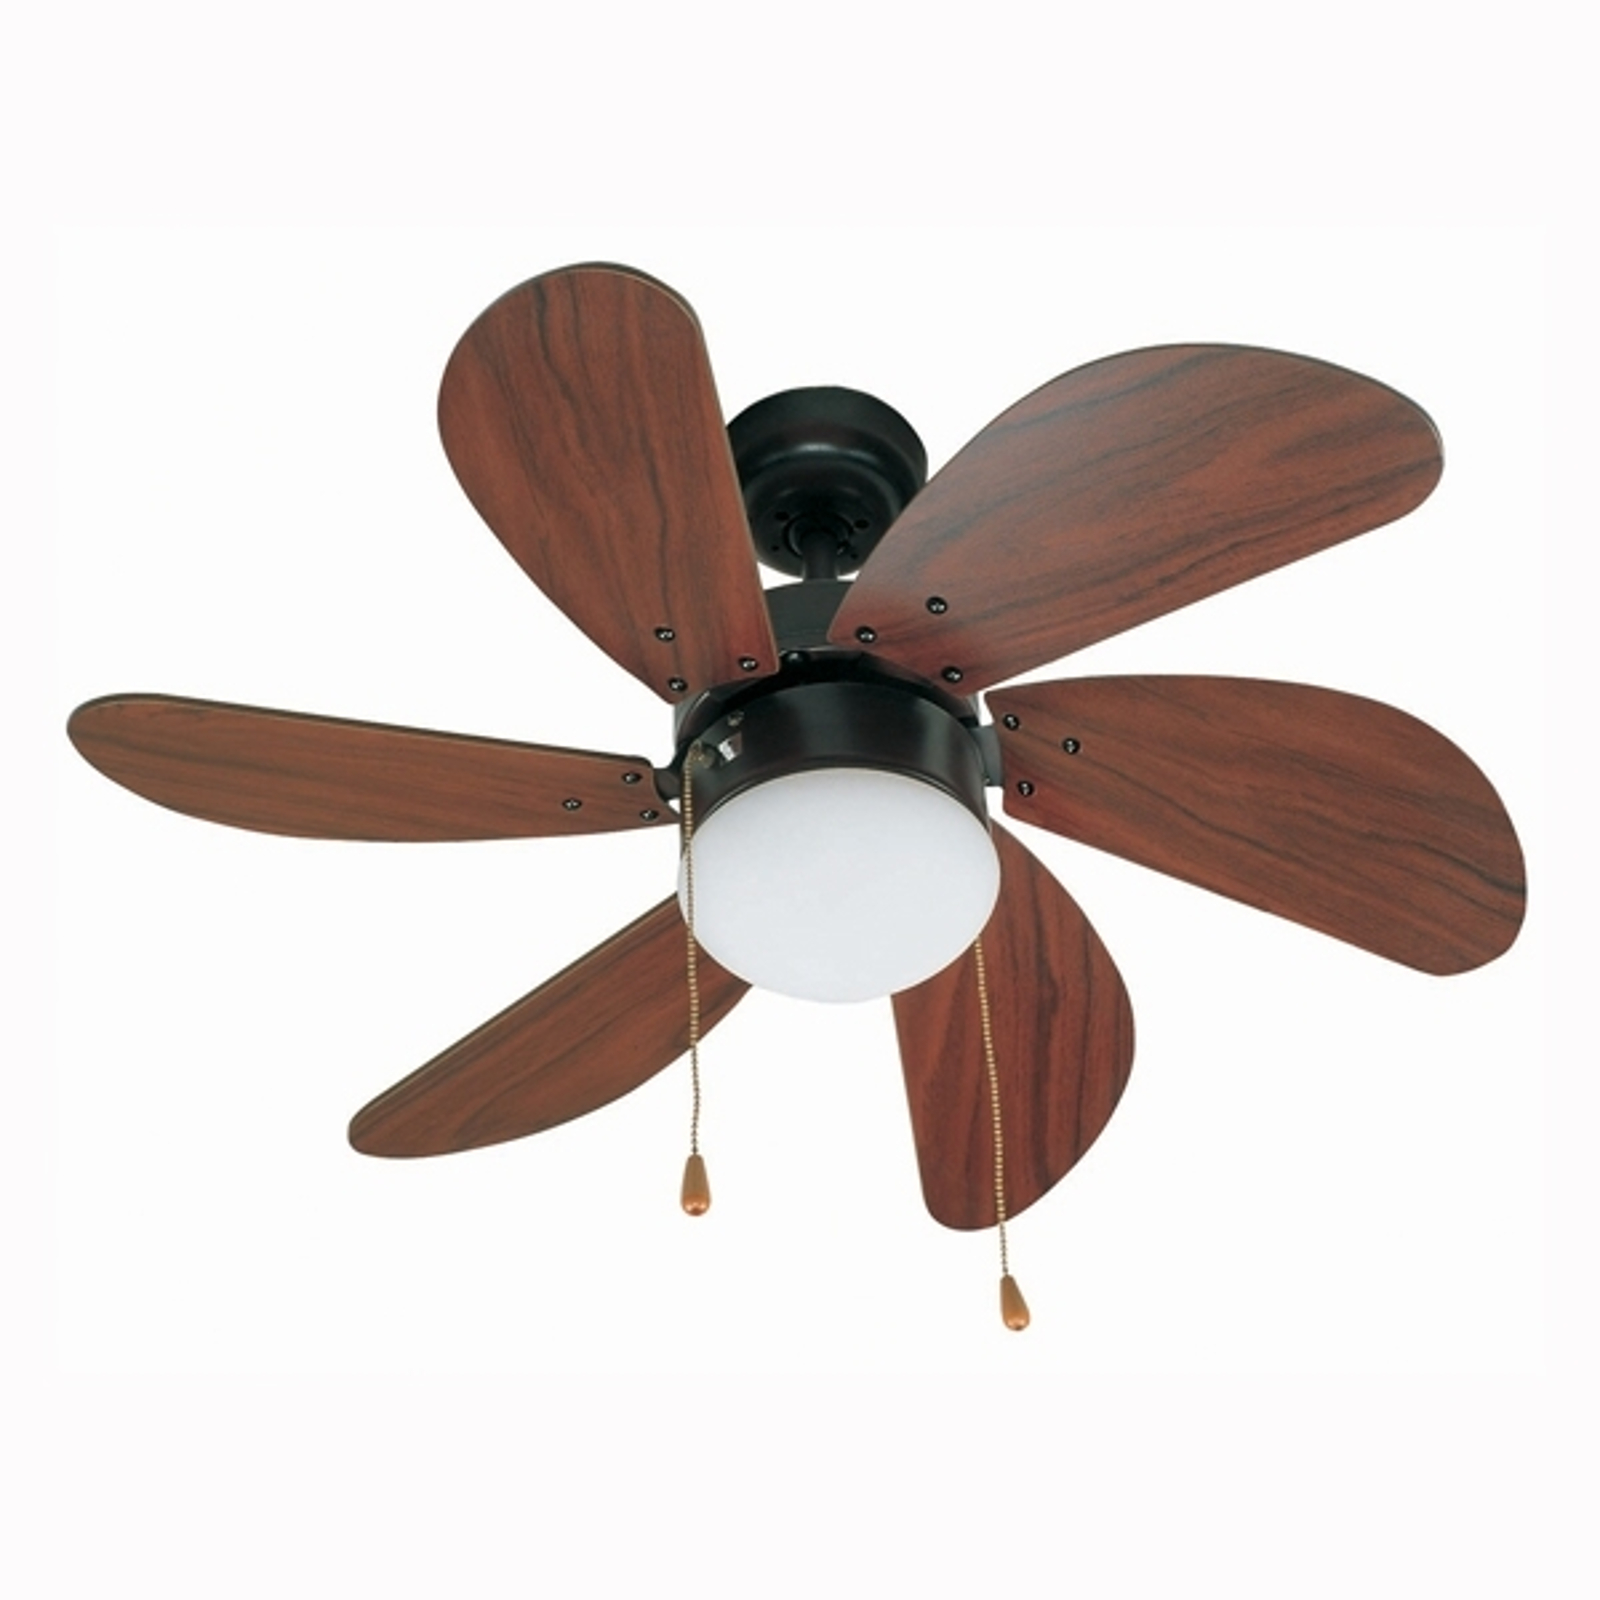 PALAO Dark Brown Ceiling Fan_3506040_1